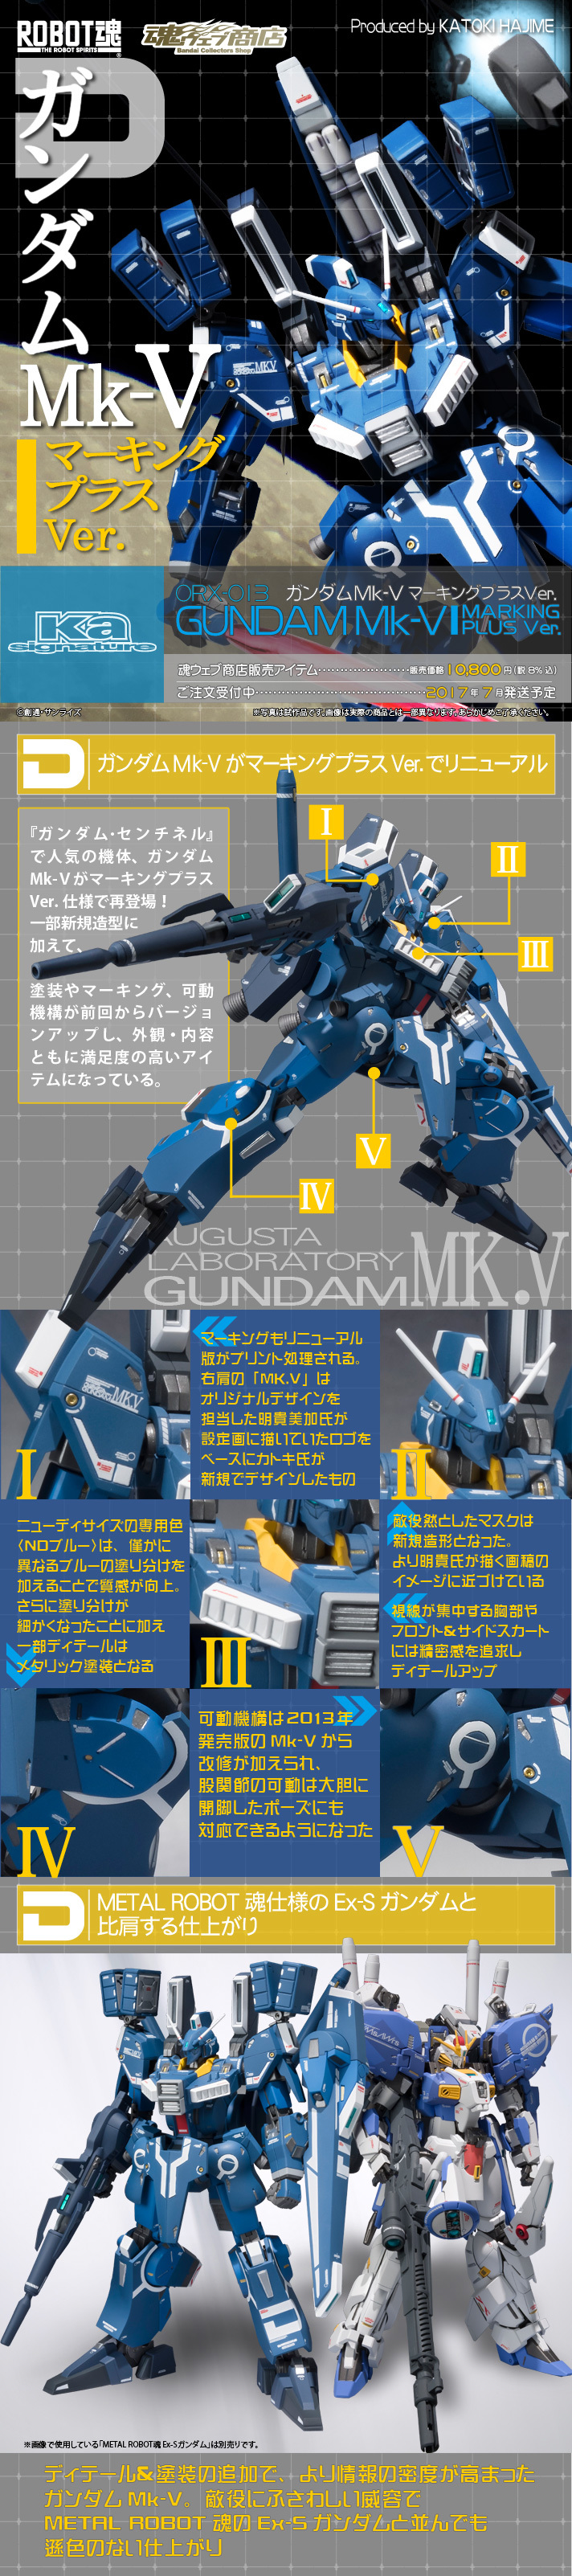 ROBOT魂(Ka signature) 〈SIDE MS〉 ガンダムMk-V マーキングプラスdtl_rs_gundammkv-mpv